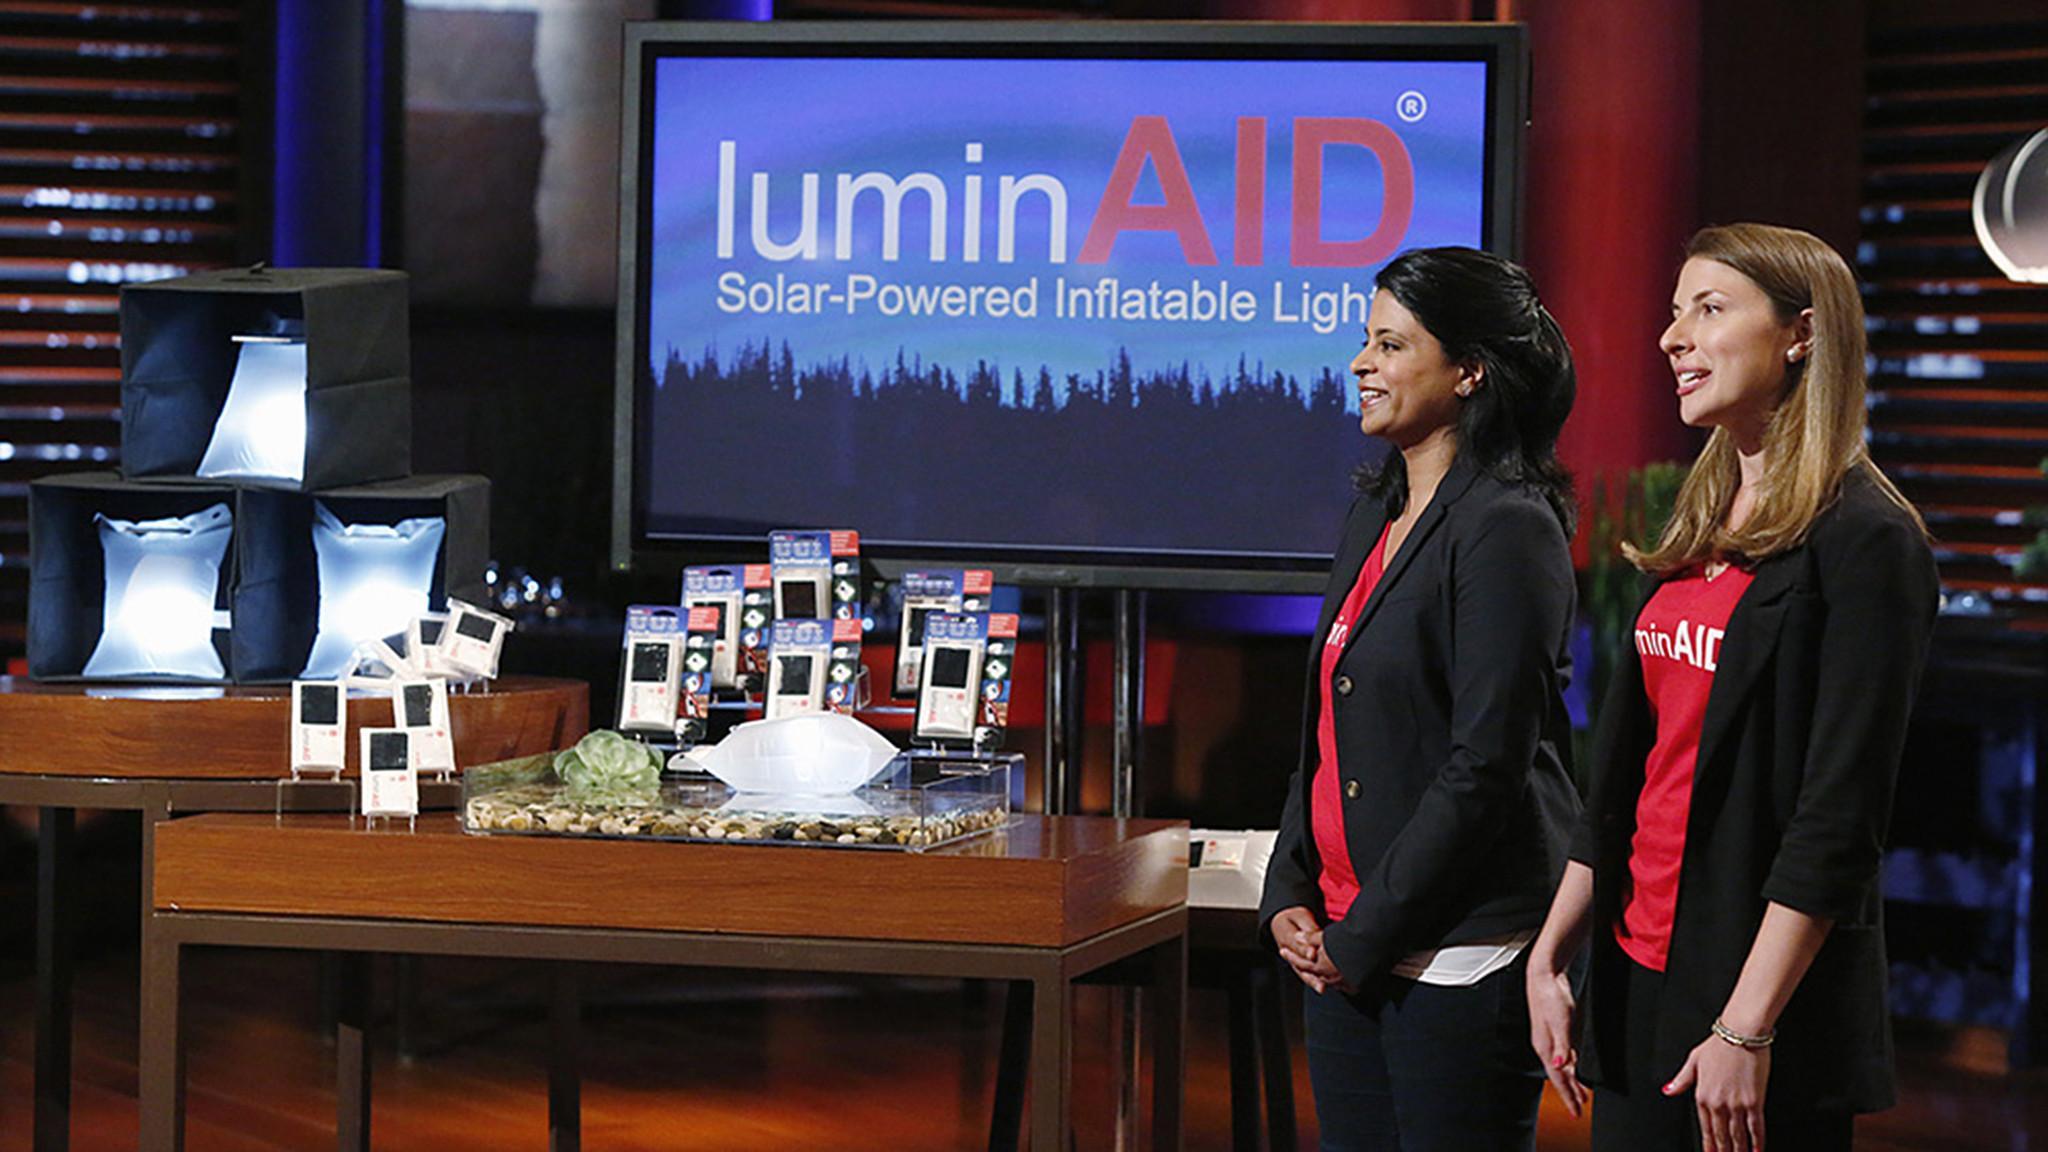 Luminaid Co Founders To Appear On Abc S Shark Tank On